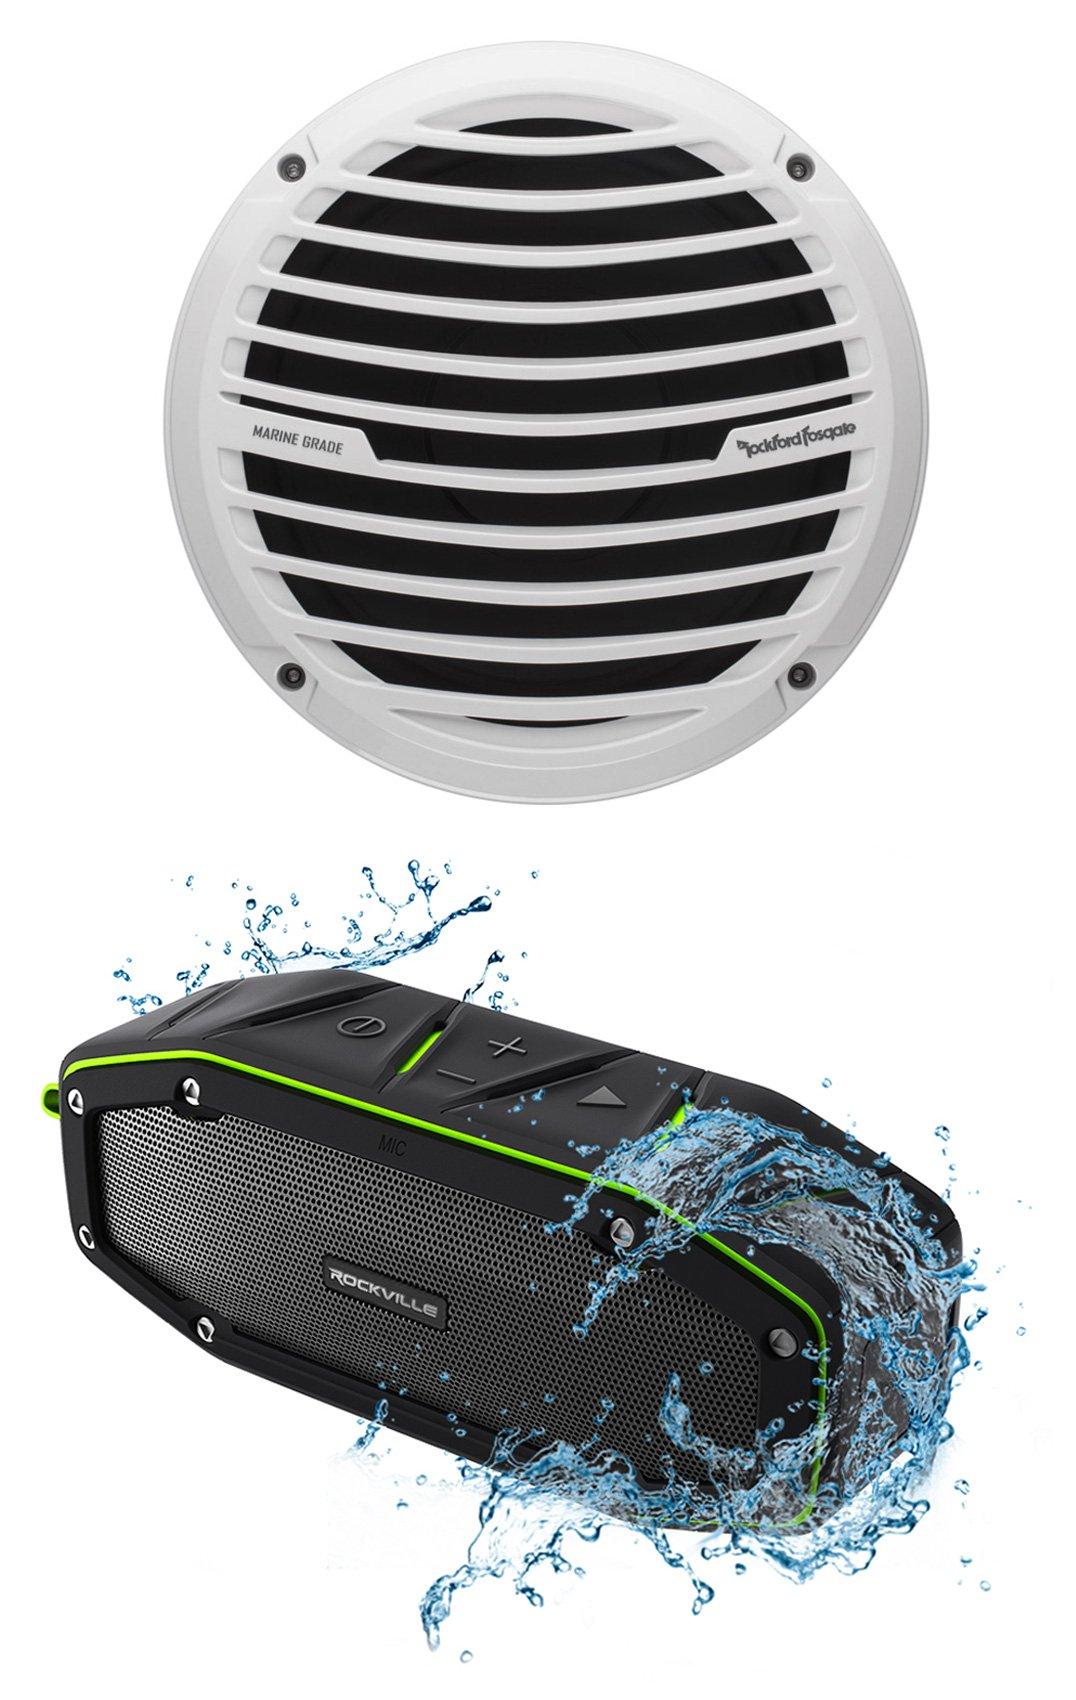 Rockford Fosgate RM18D2 8'' 300W Marine/Boat Subwoofer Prime Sub + Free Speaker